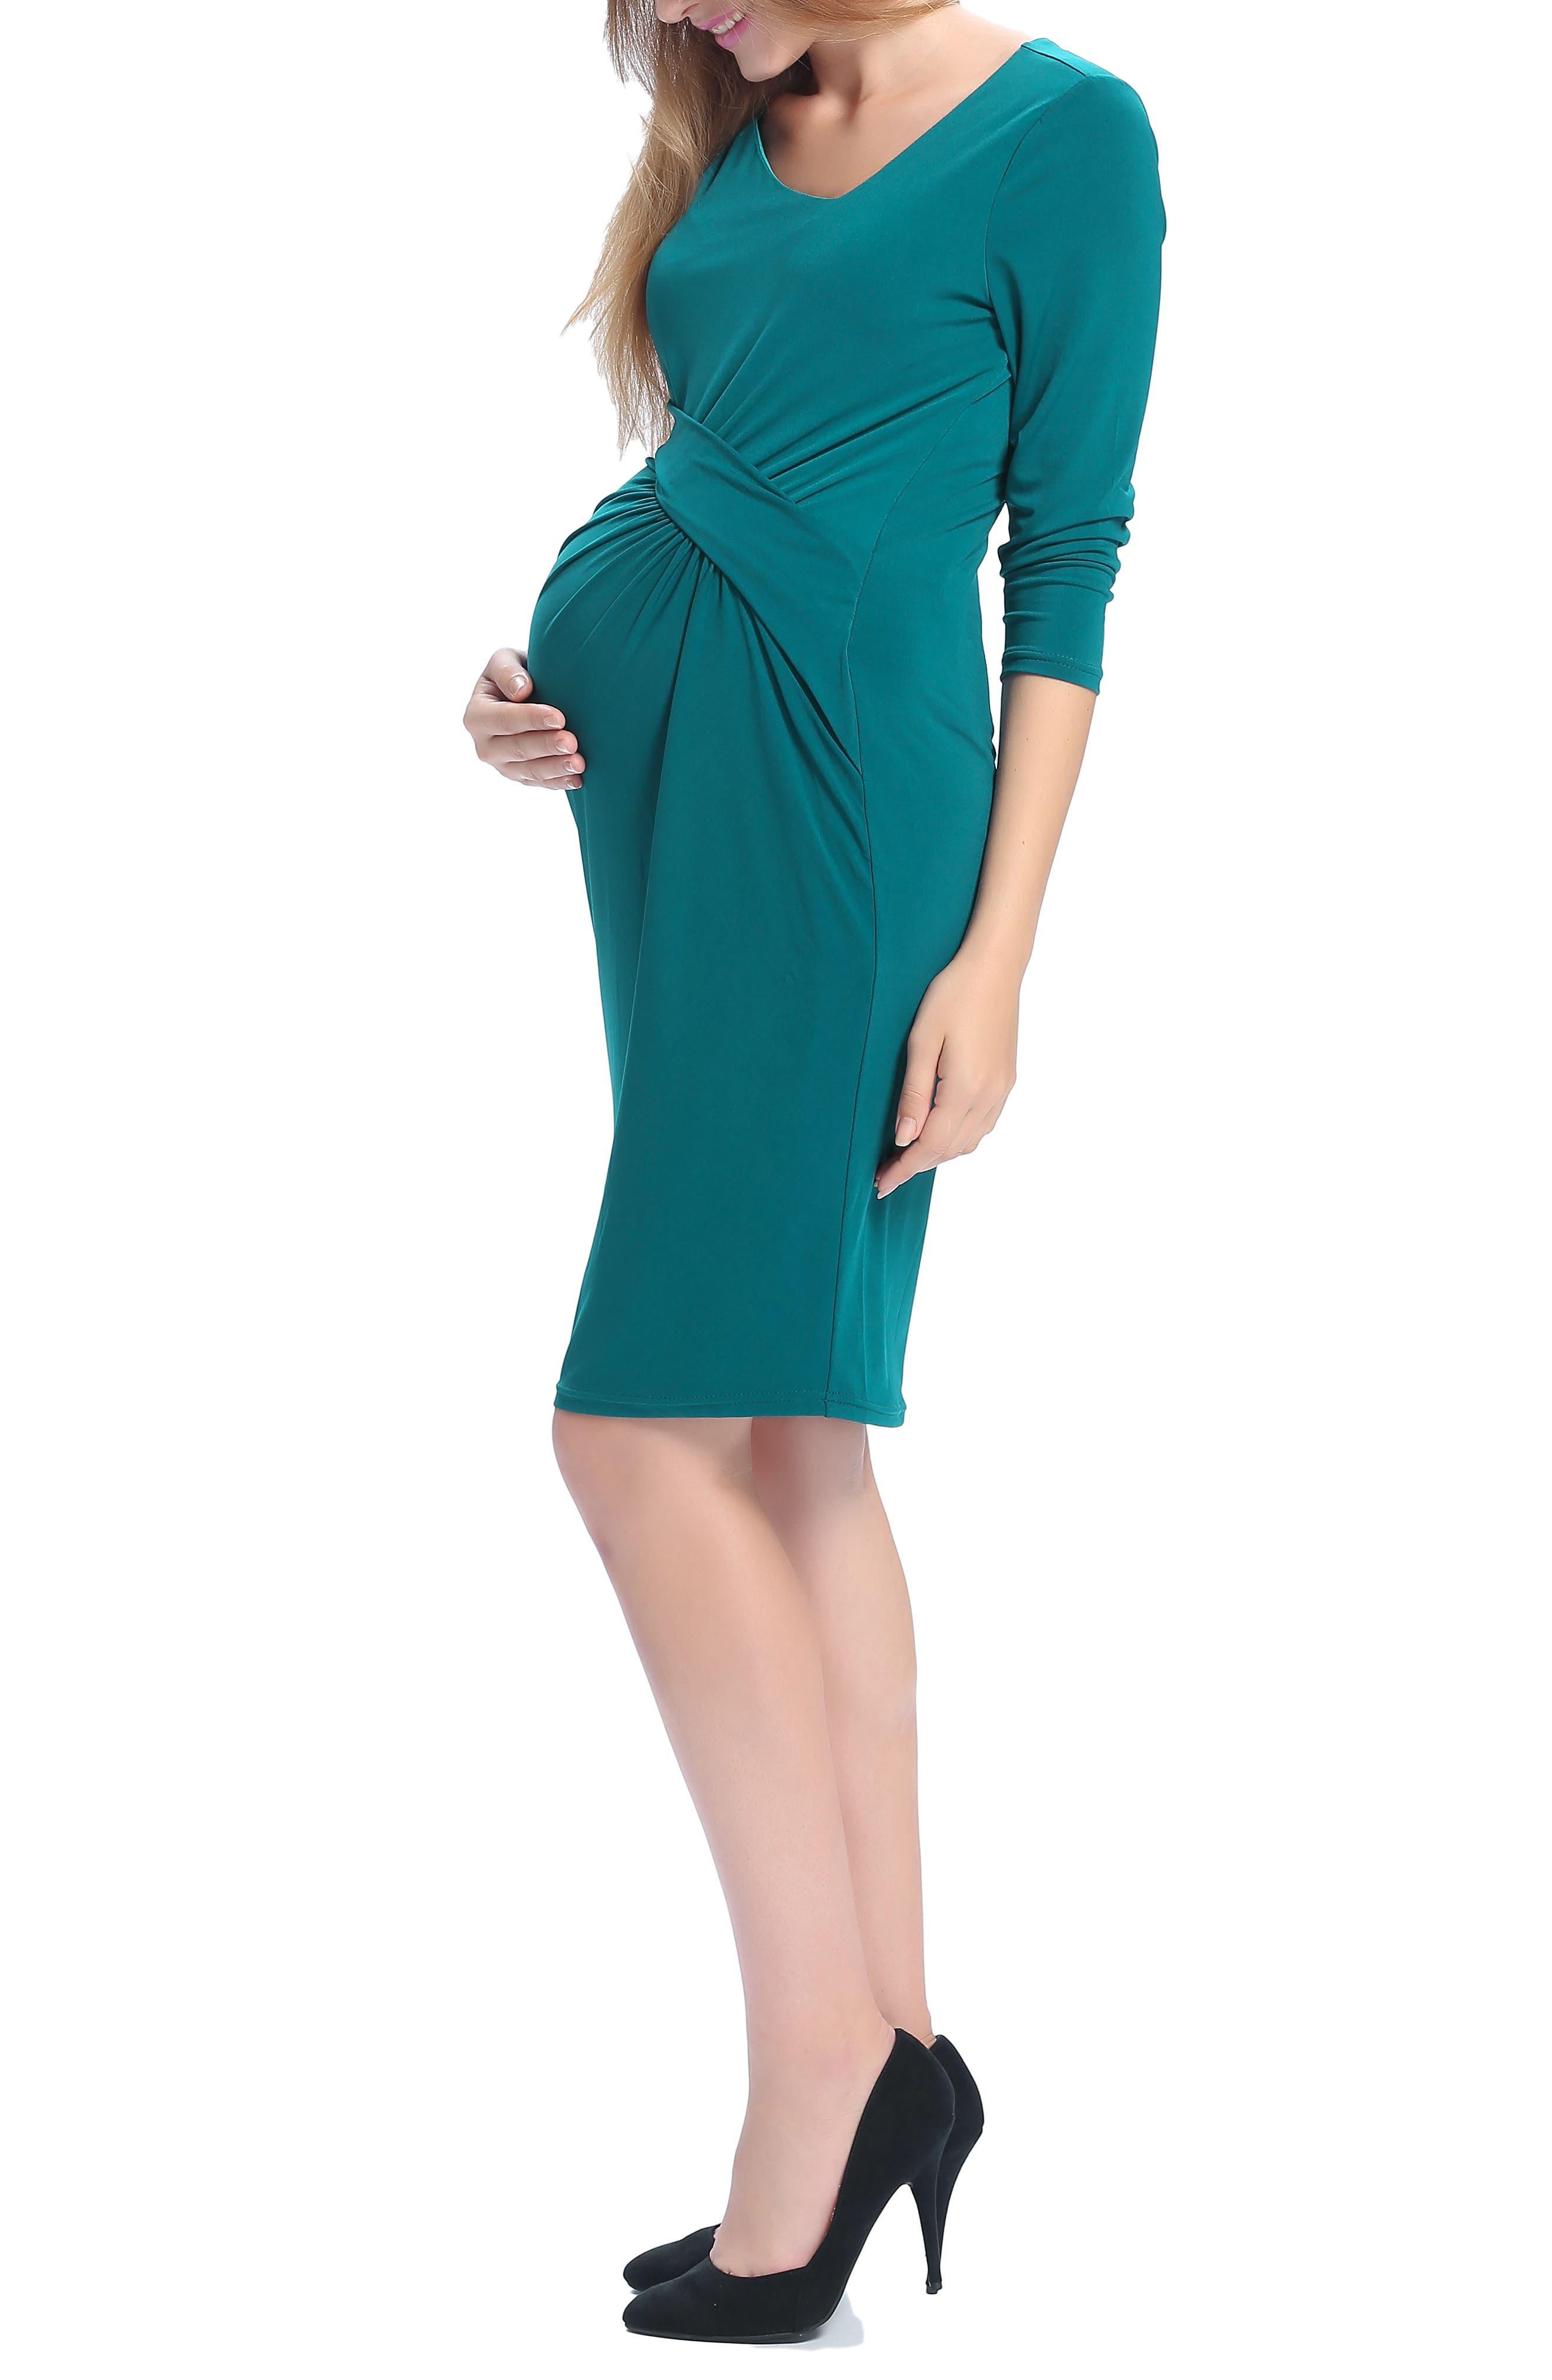 Teagan Body-Con Maternity Dress,                             Alternate thumbnail 3, color,                             TEAL